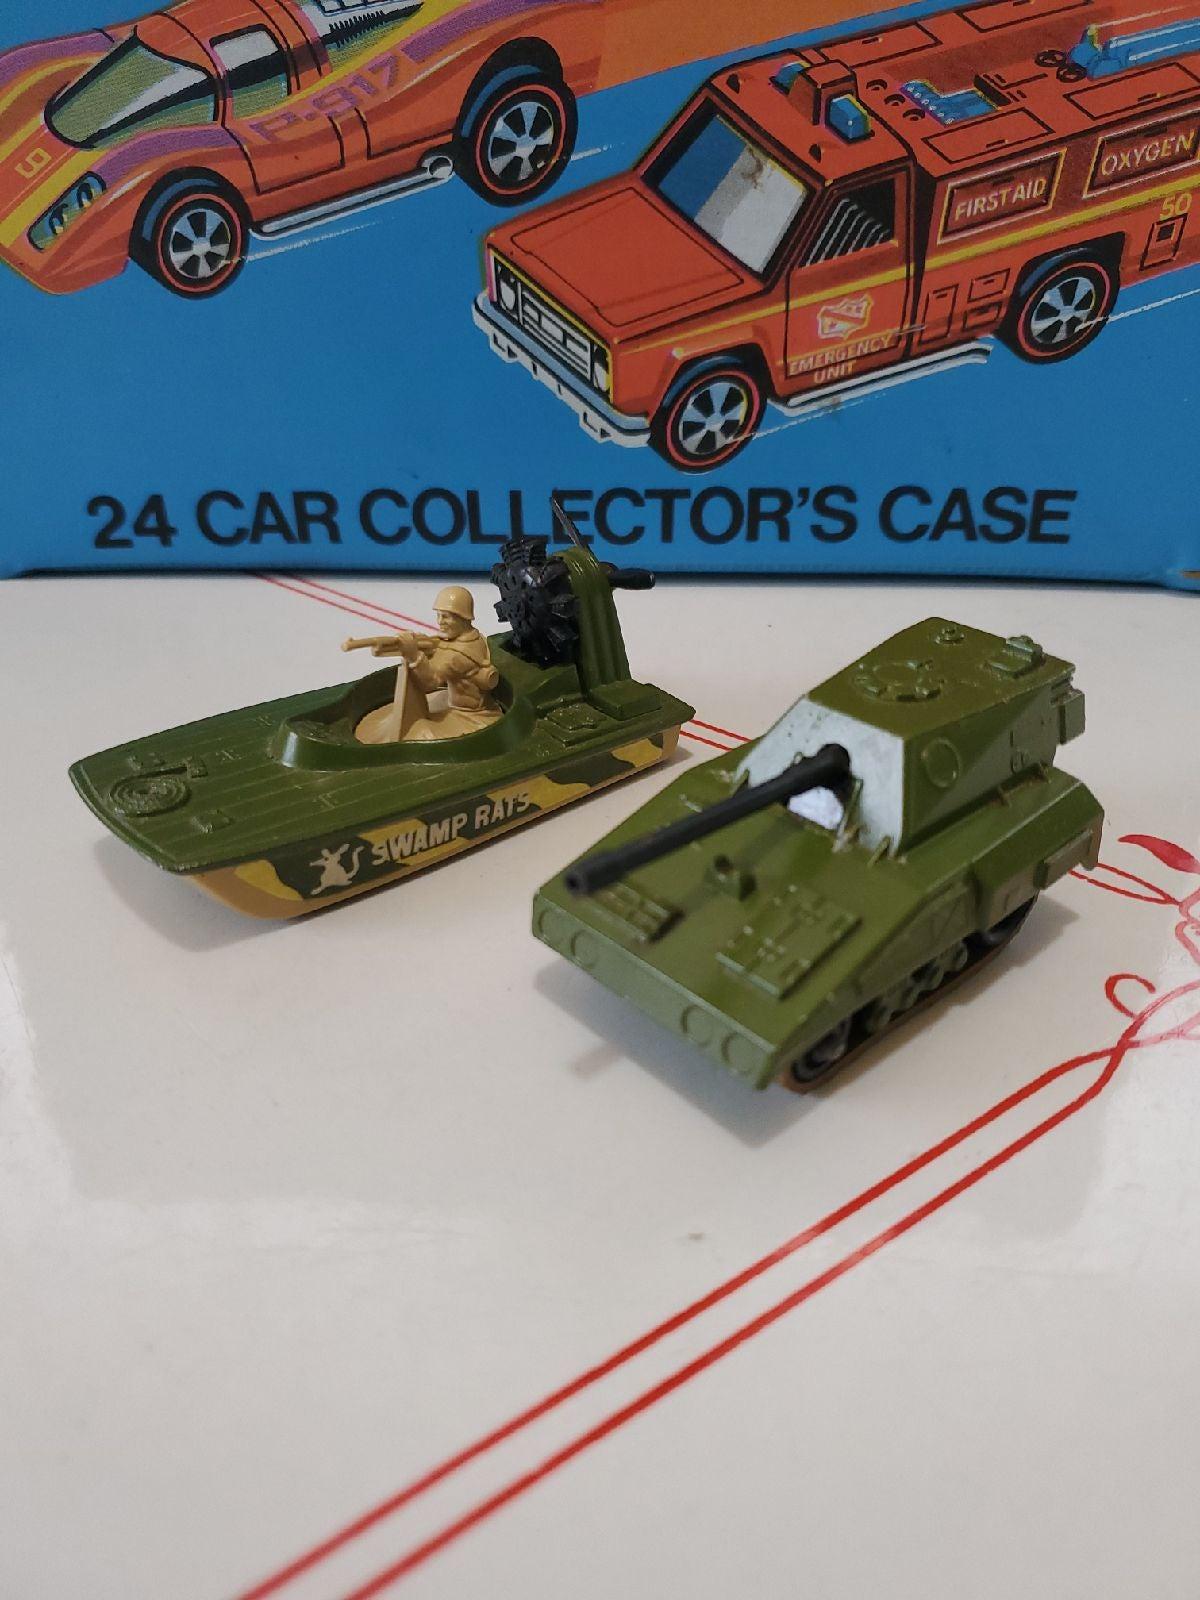 1976 matchbox lesney sp gun and swamp ra